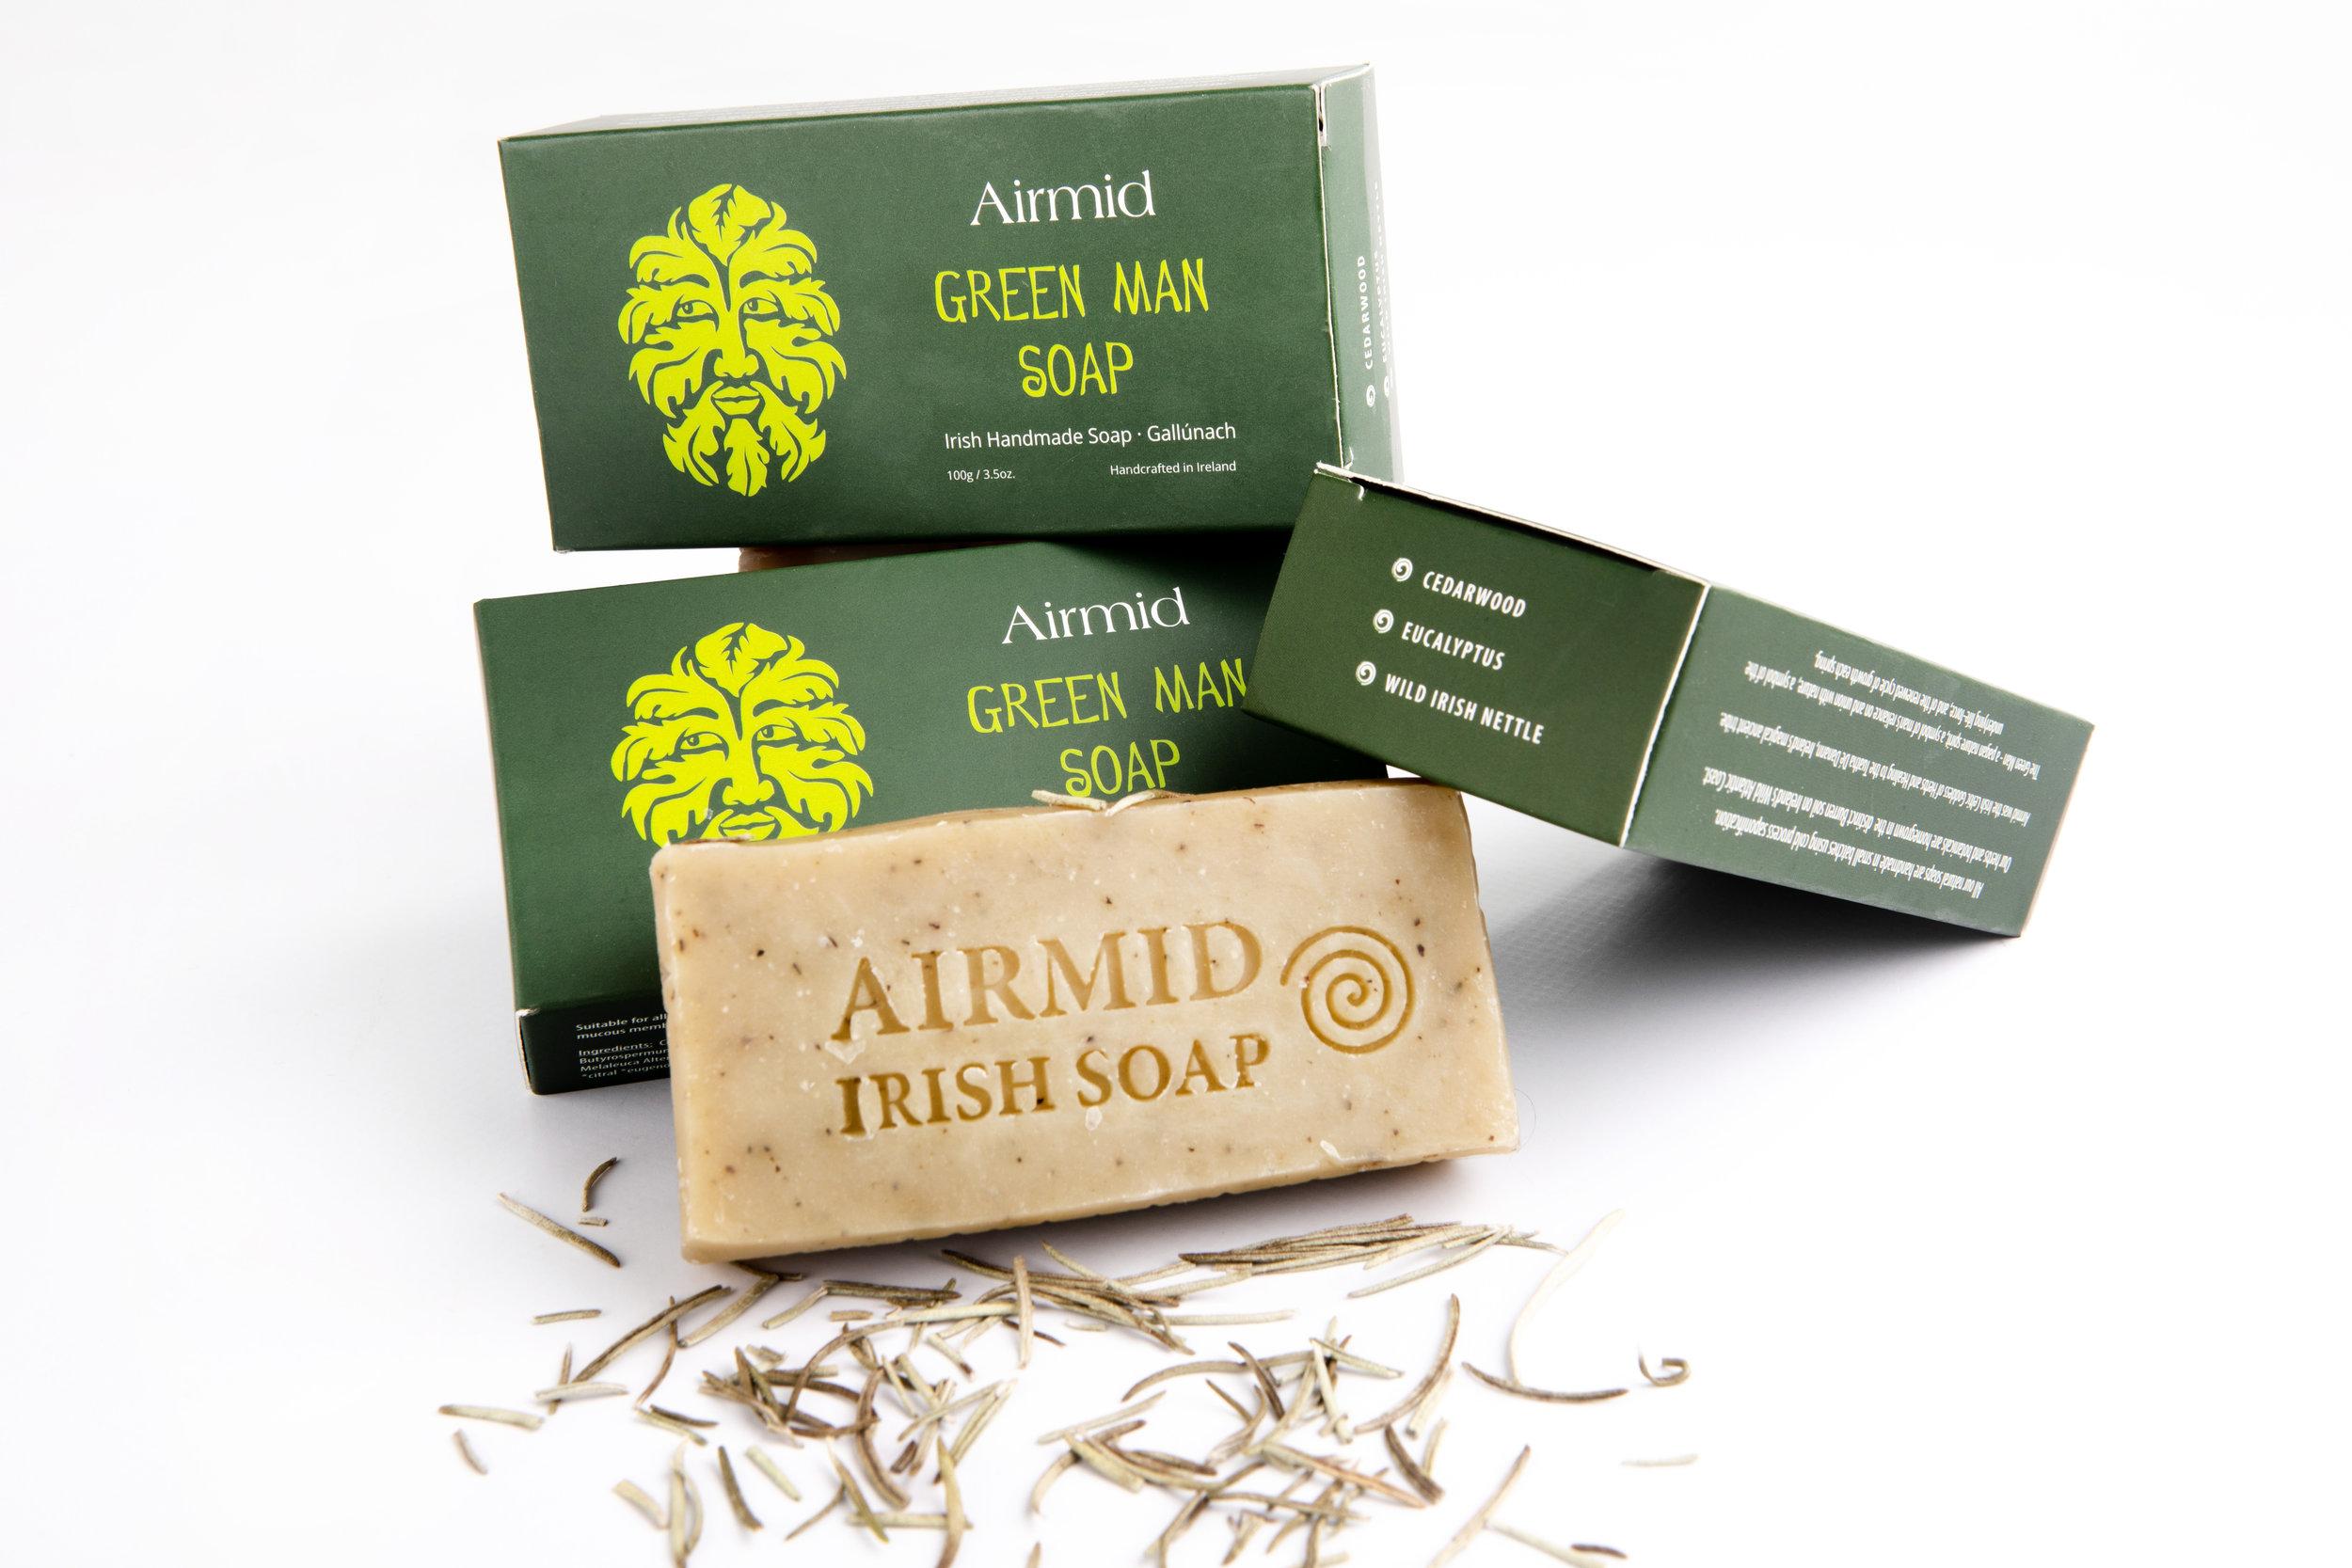 Airmid Products0020.jpg